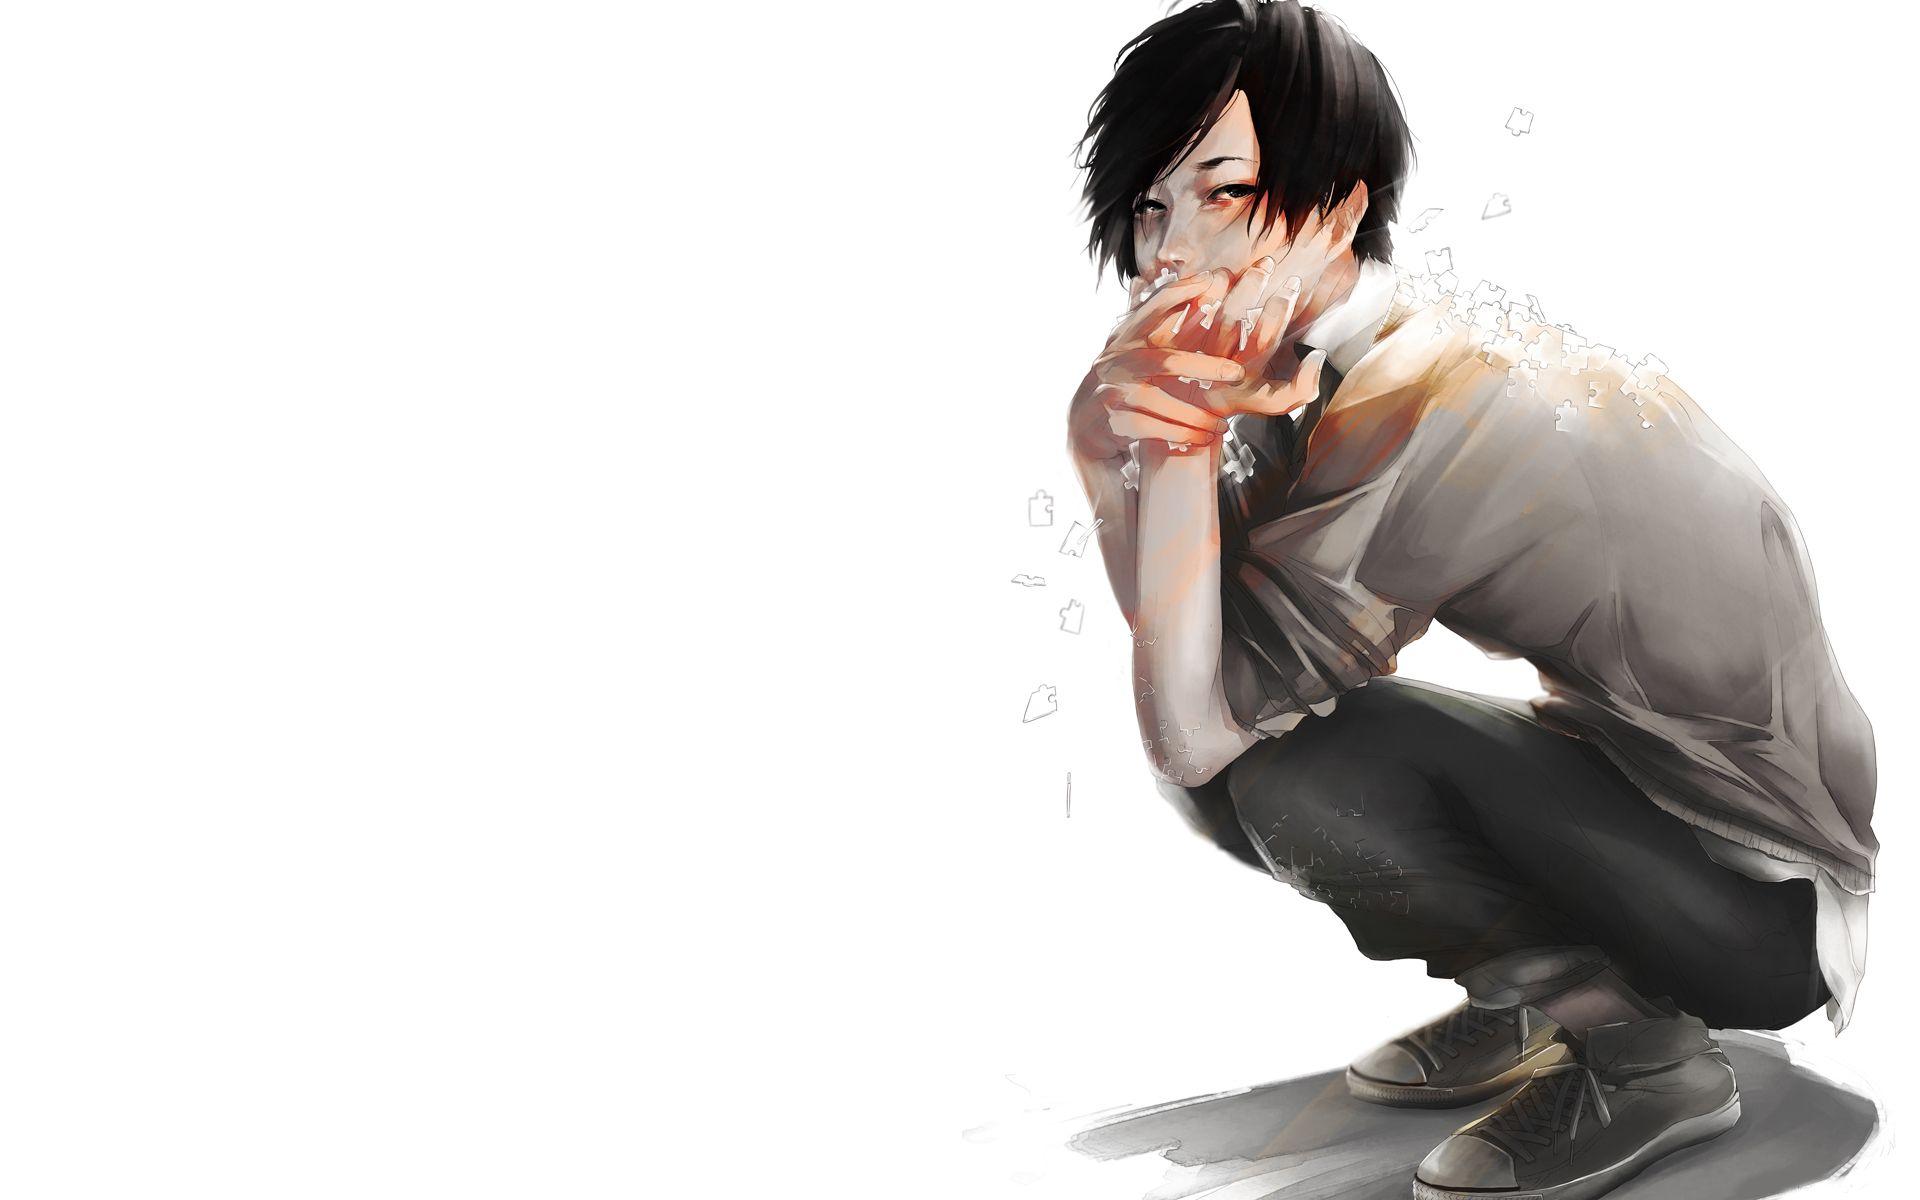 Anime cool boy sitting look art sadness jigsaw puzzle hd - Cool boy wallpaper hd download ...